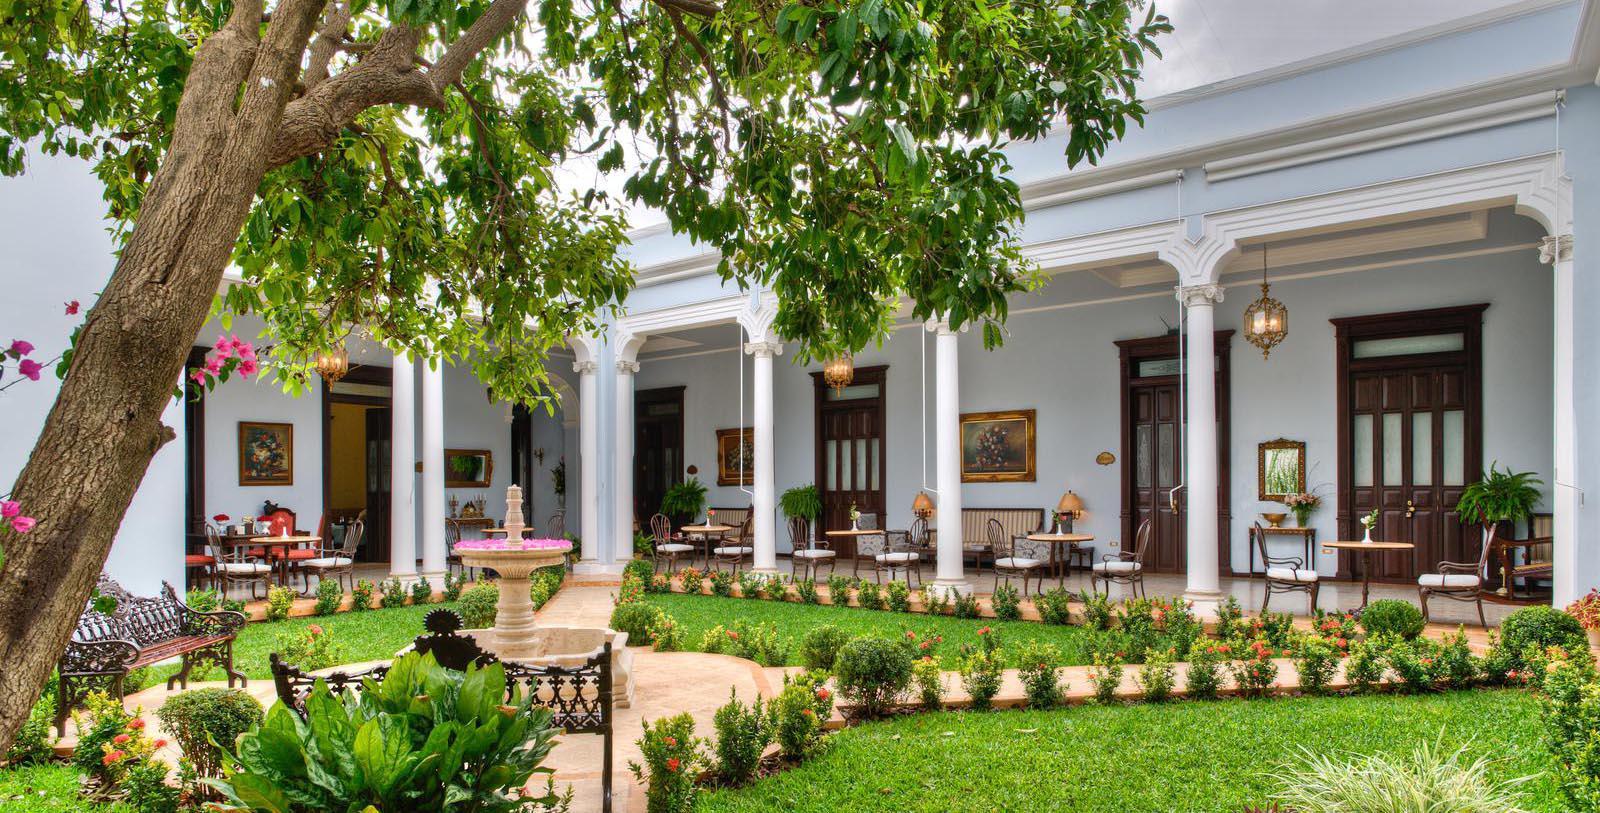 Daytime courtyard and gardens at Casa Azul Hotel Monumento Historico in Mexico.